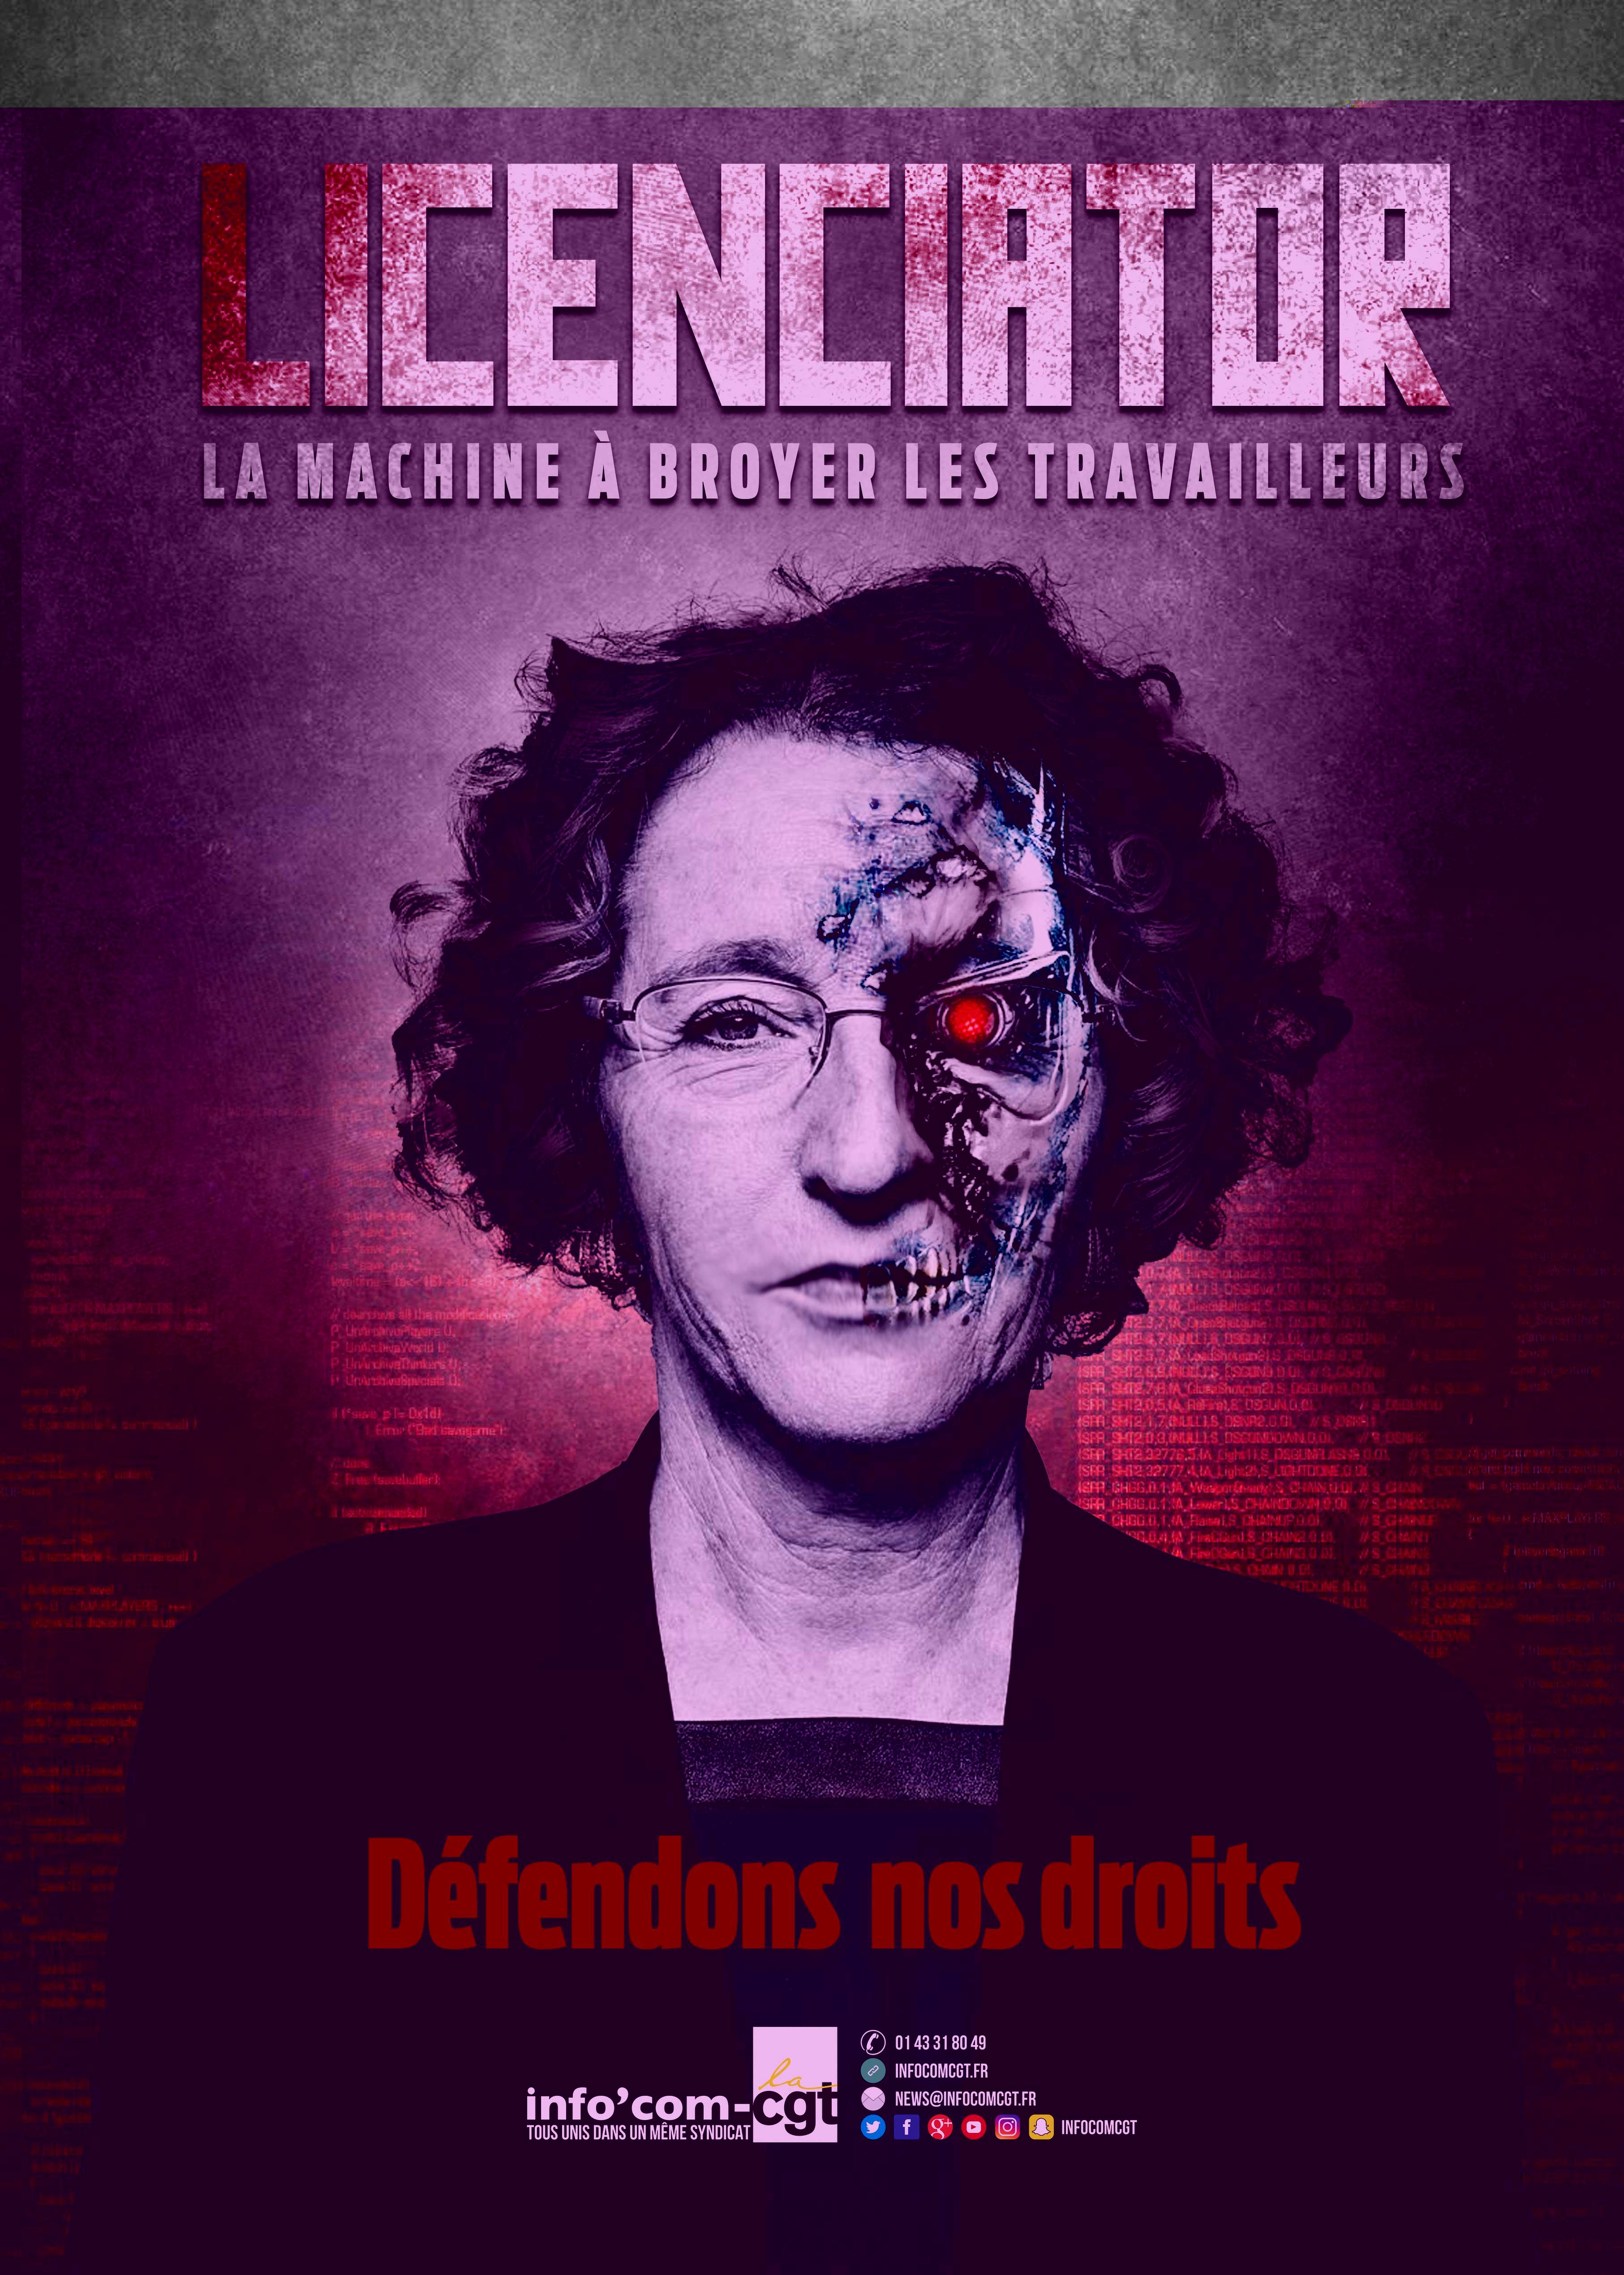 938. Licenciements Penicaud